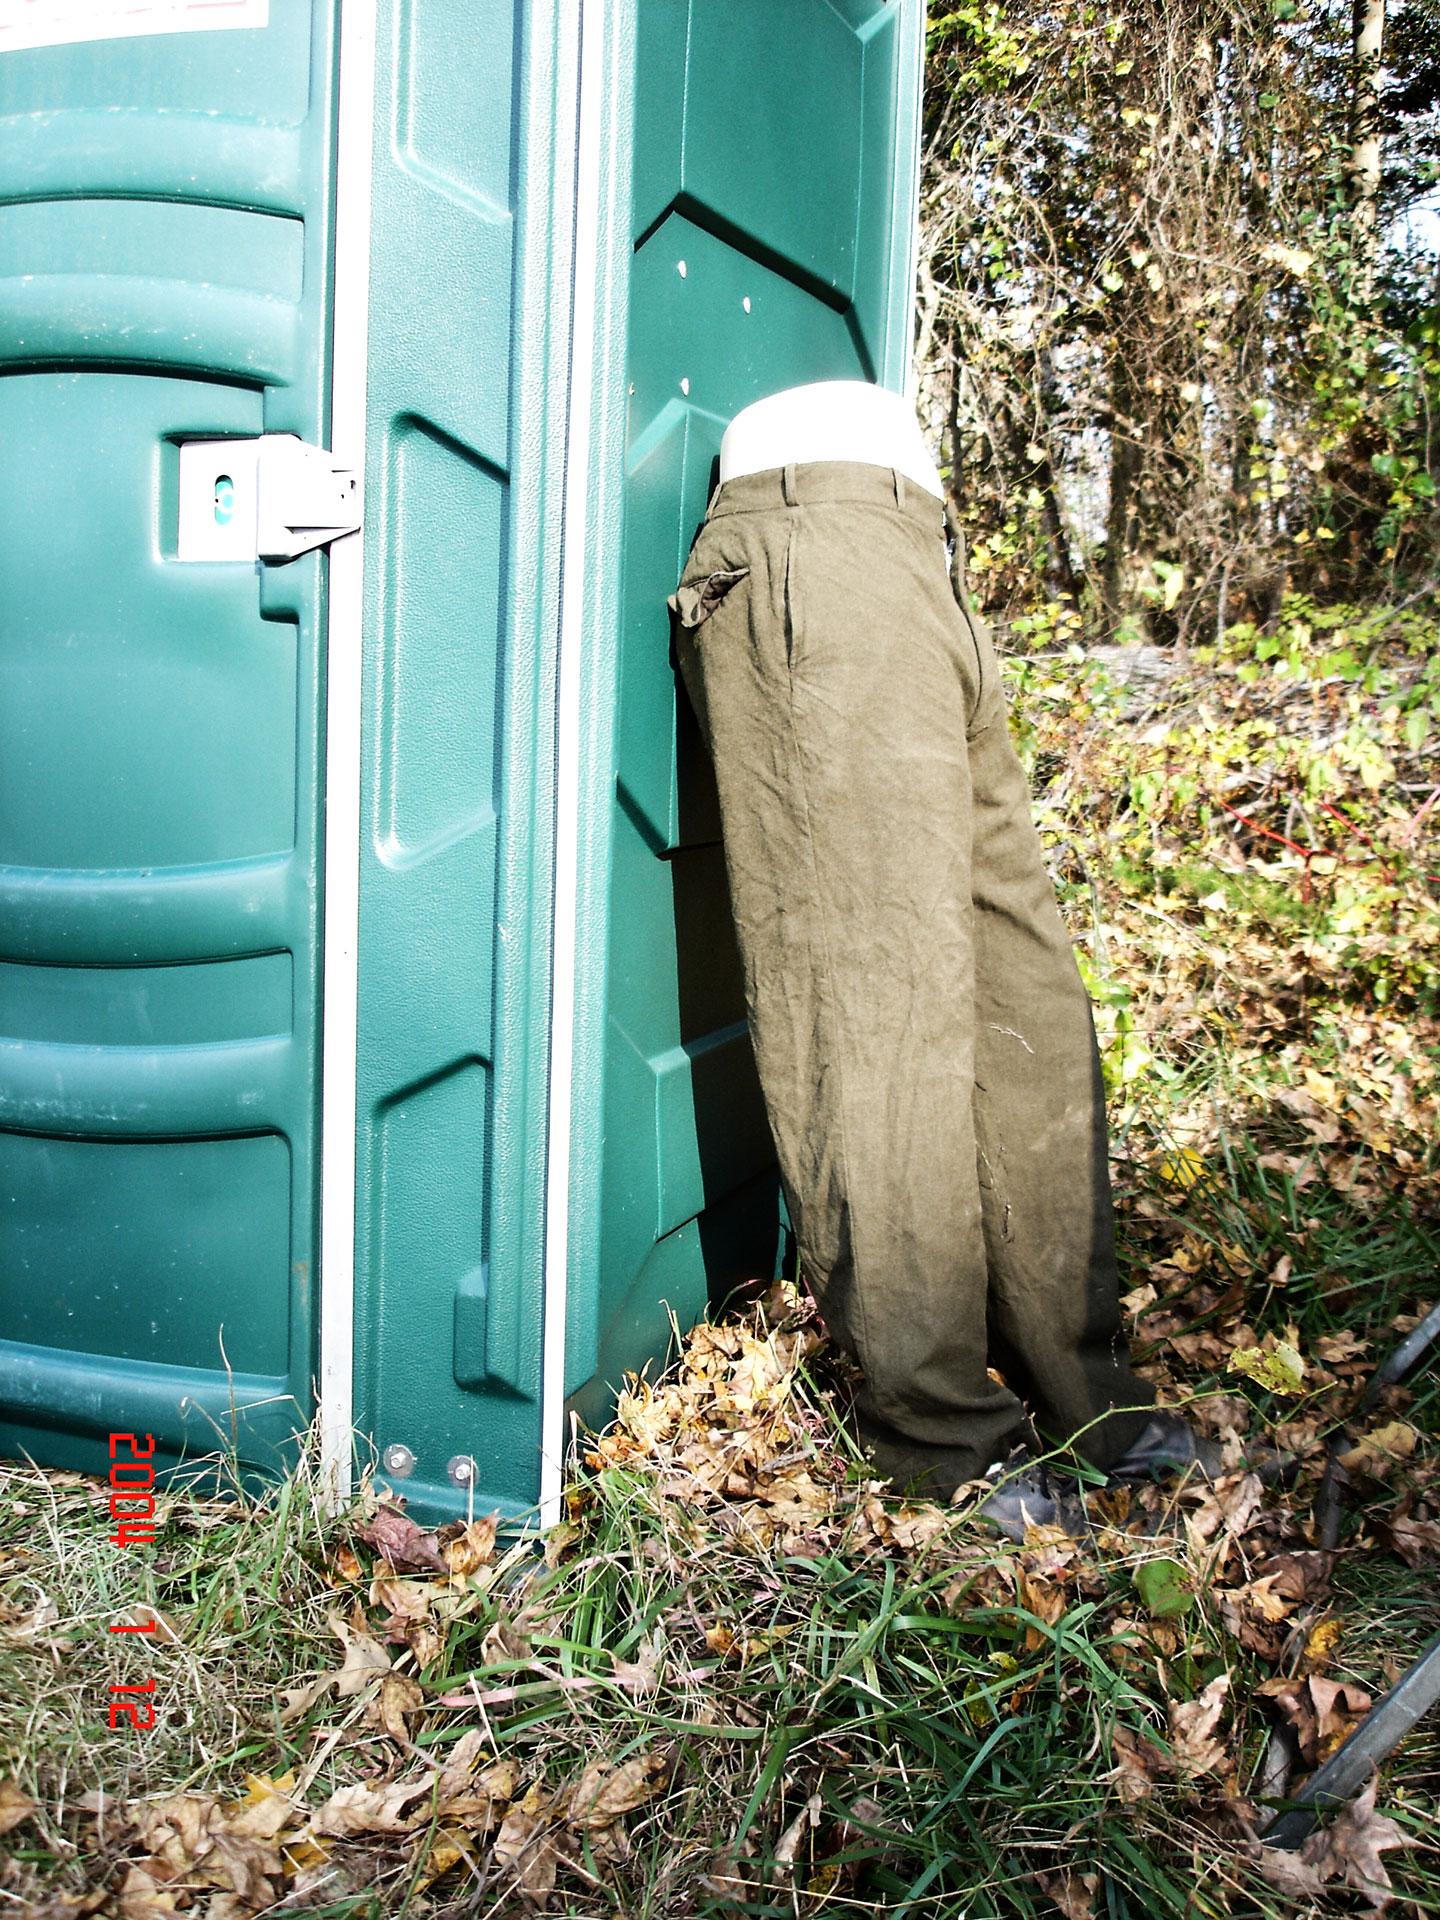 Rudy-Poe-LibertyBTS-pants-outhouse-1920-web.jpg